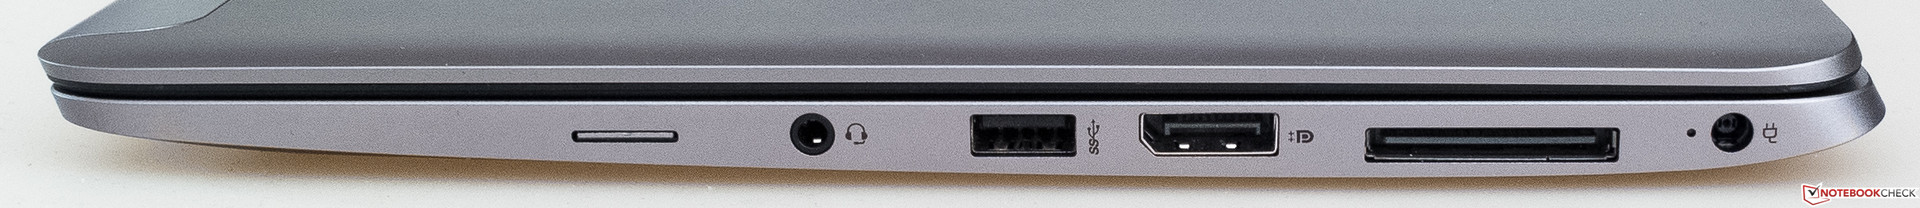 hp folio 1040 audio driver